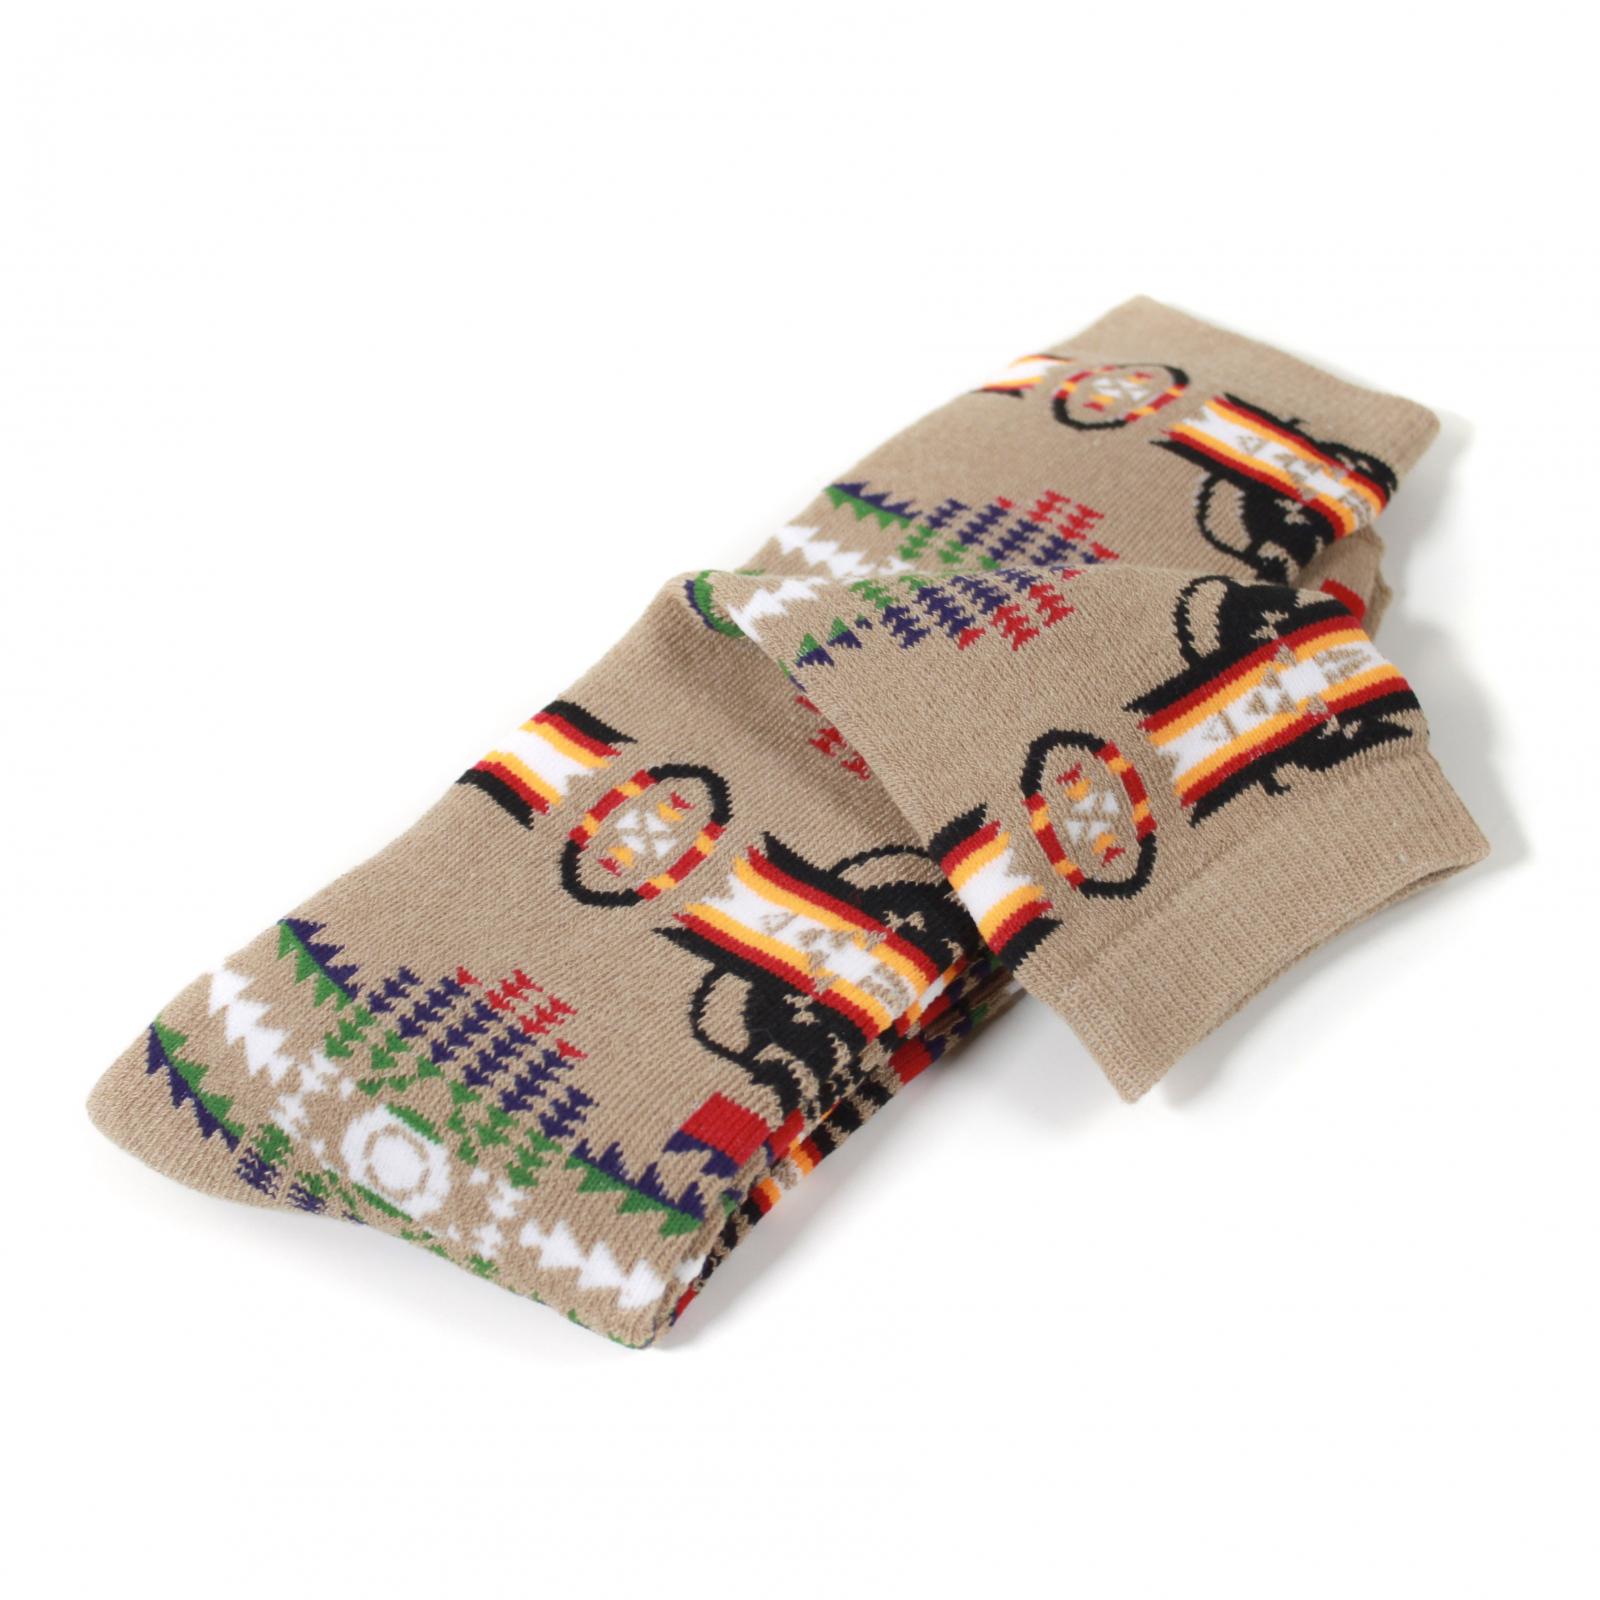 ASR Outdoor Adventure Wilderness Socks One Size Fits Most Southwest Pattern Brown